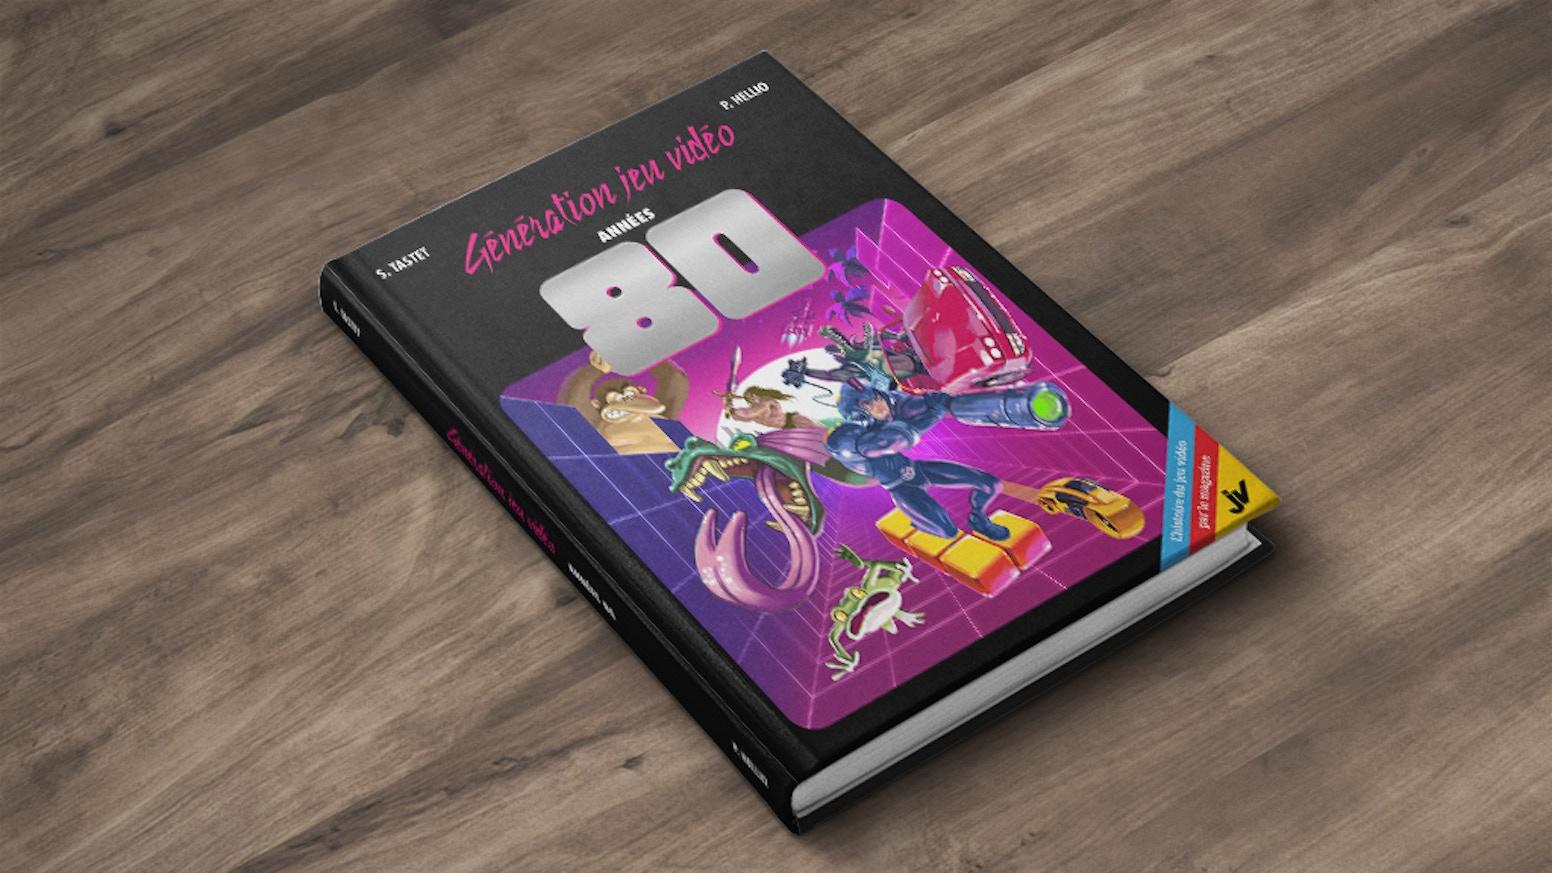 g n ration jeu vid o ann es 80 by jv le magazine de la culture jeu vid o kickstarter. Black Bedroom Furniture Sets. Home Design Ideas